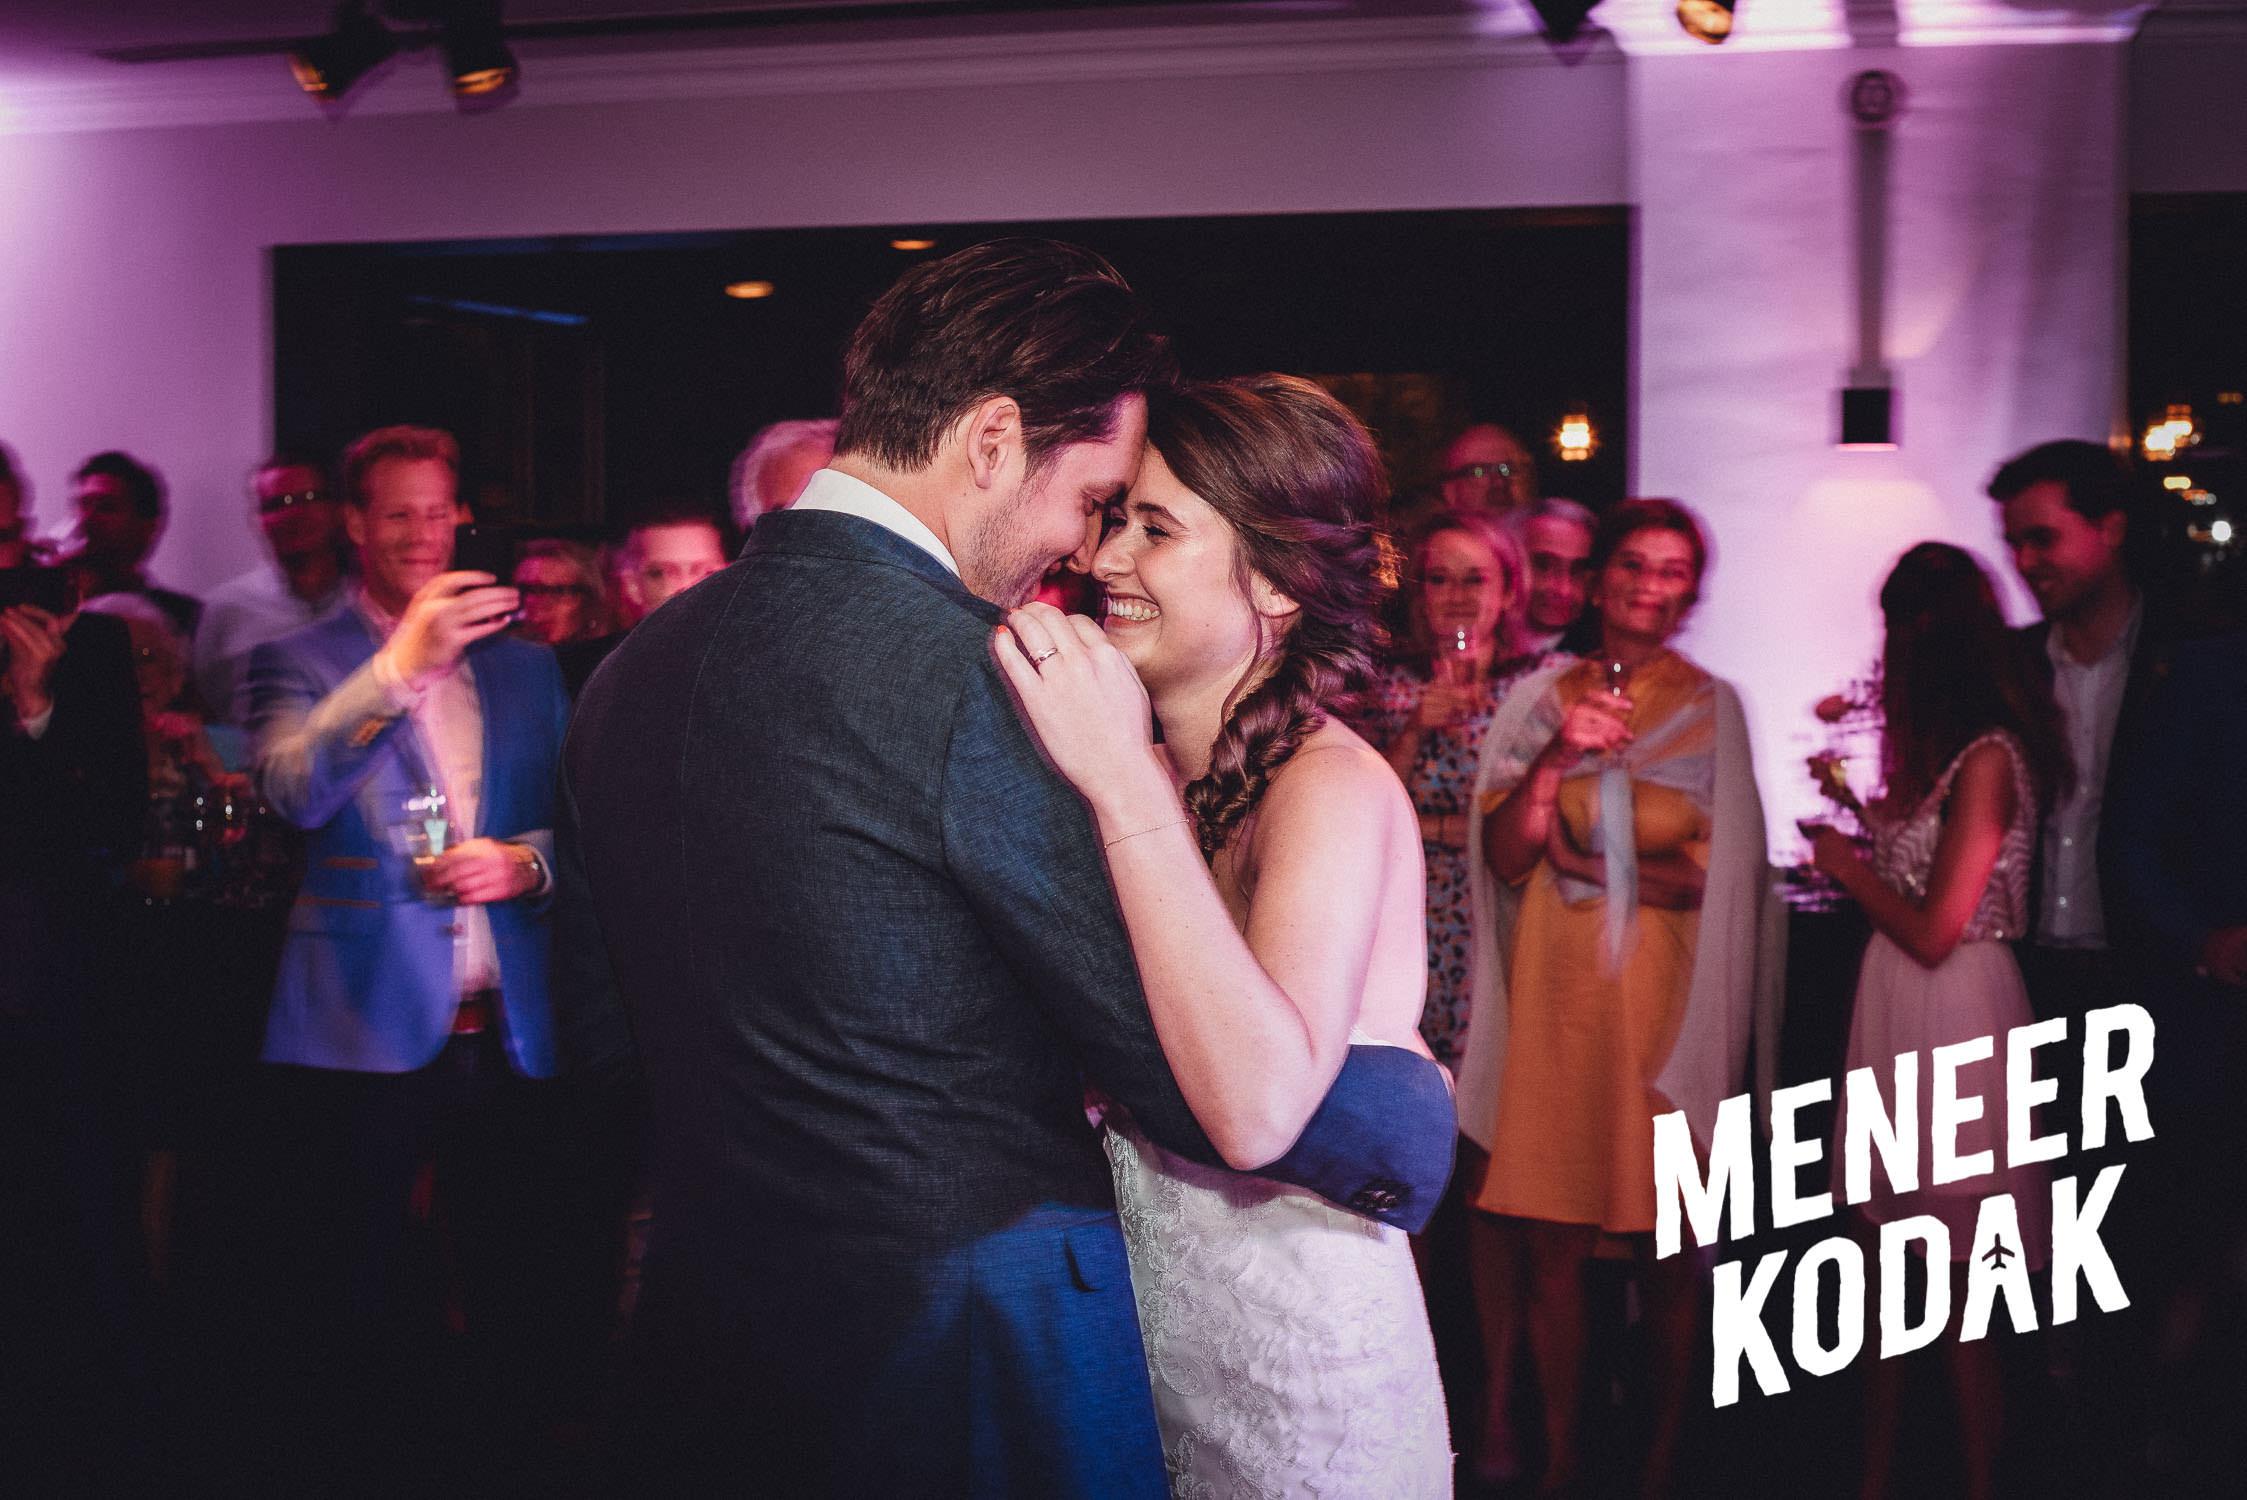 Meneer Kodak - Trouwreportage - Breda - E&M-138.jpg